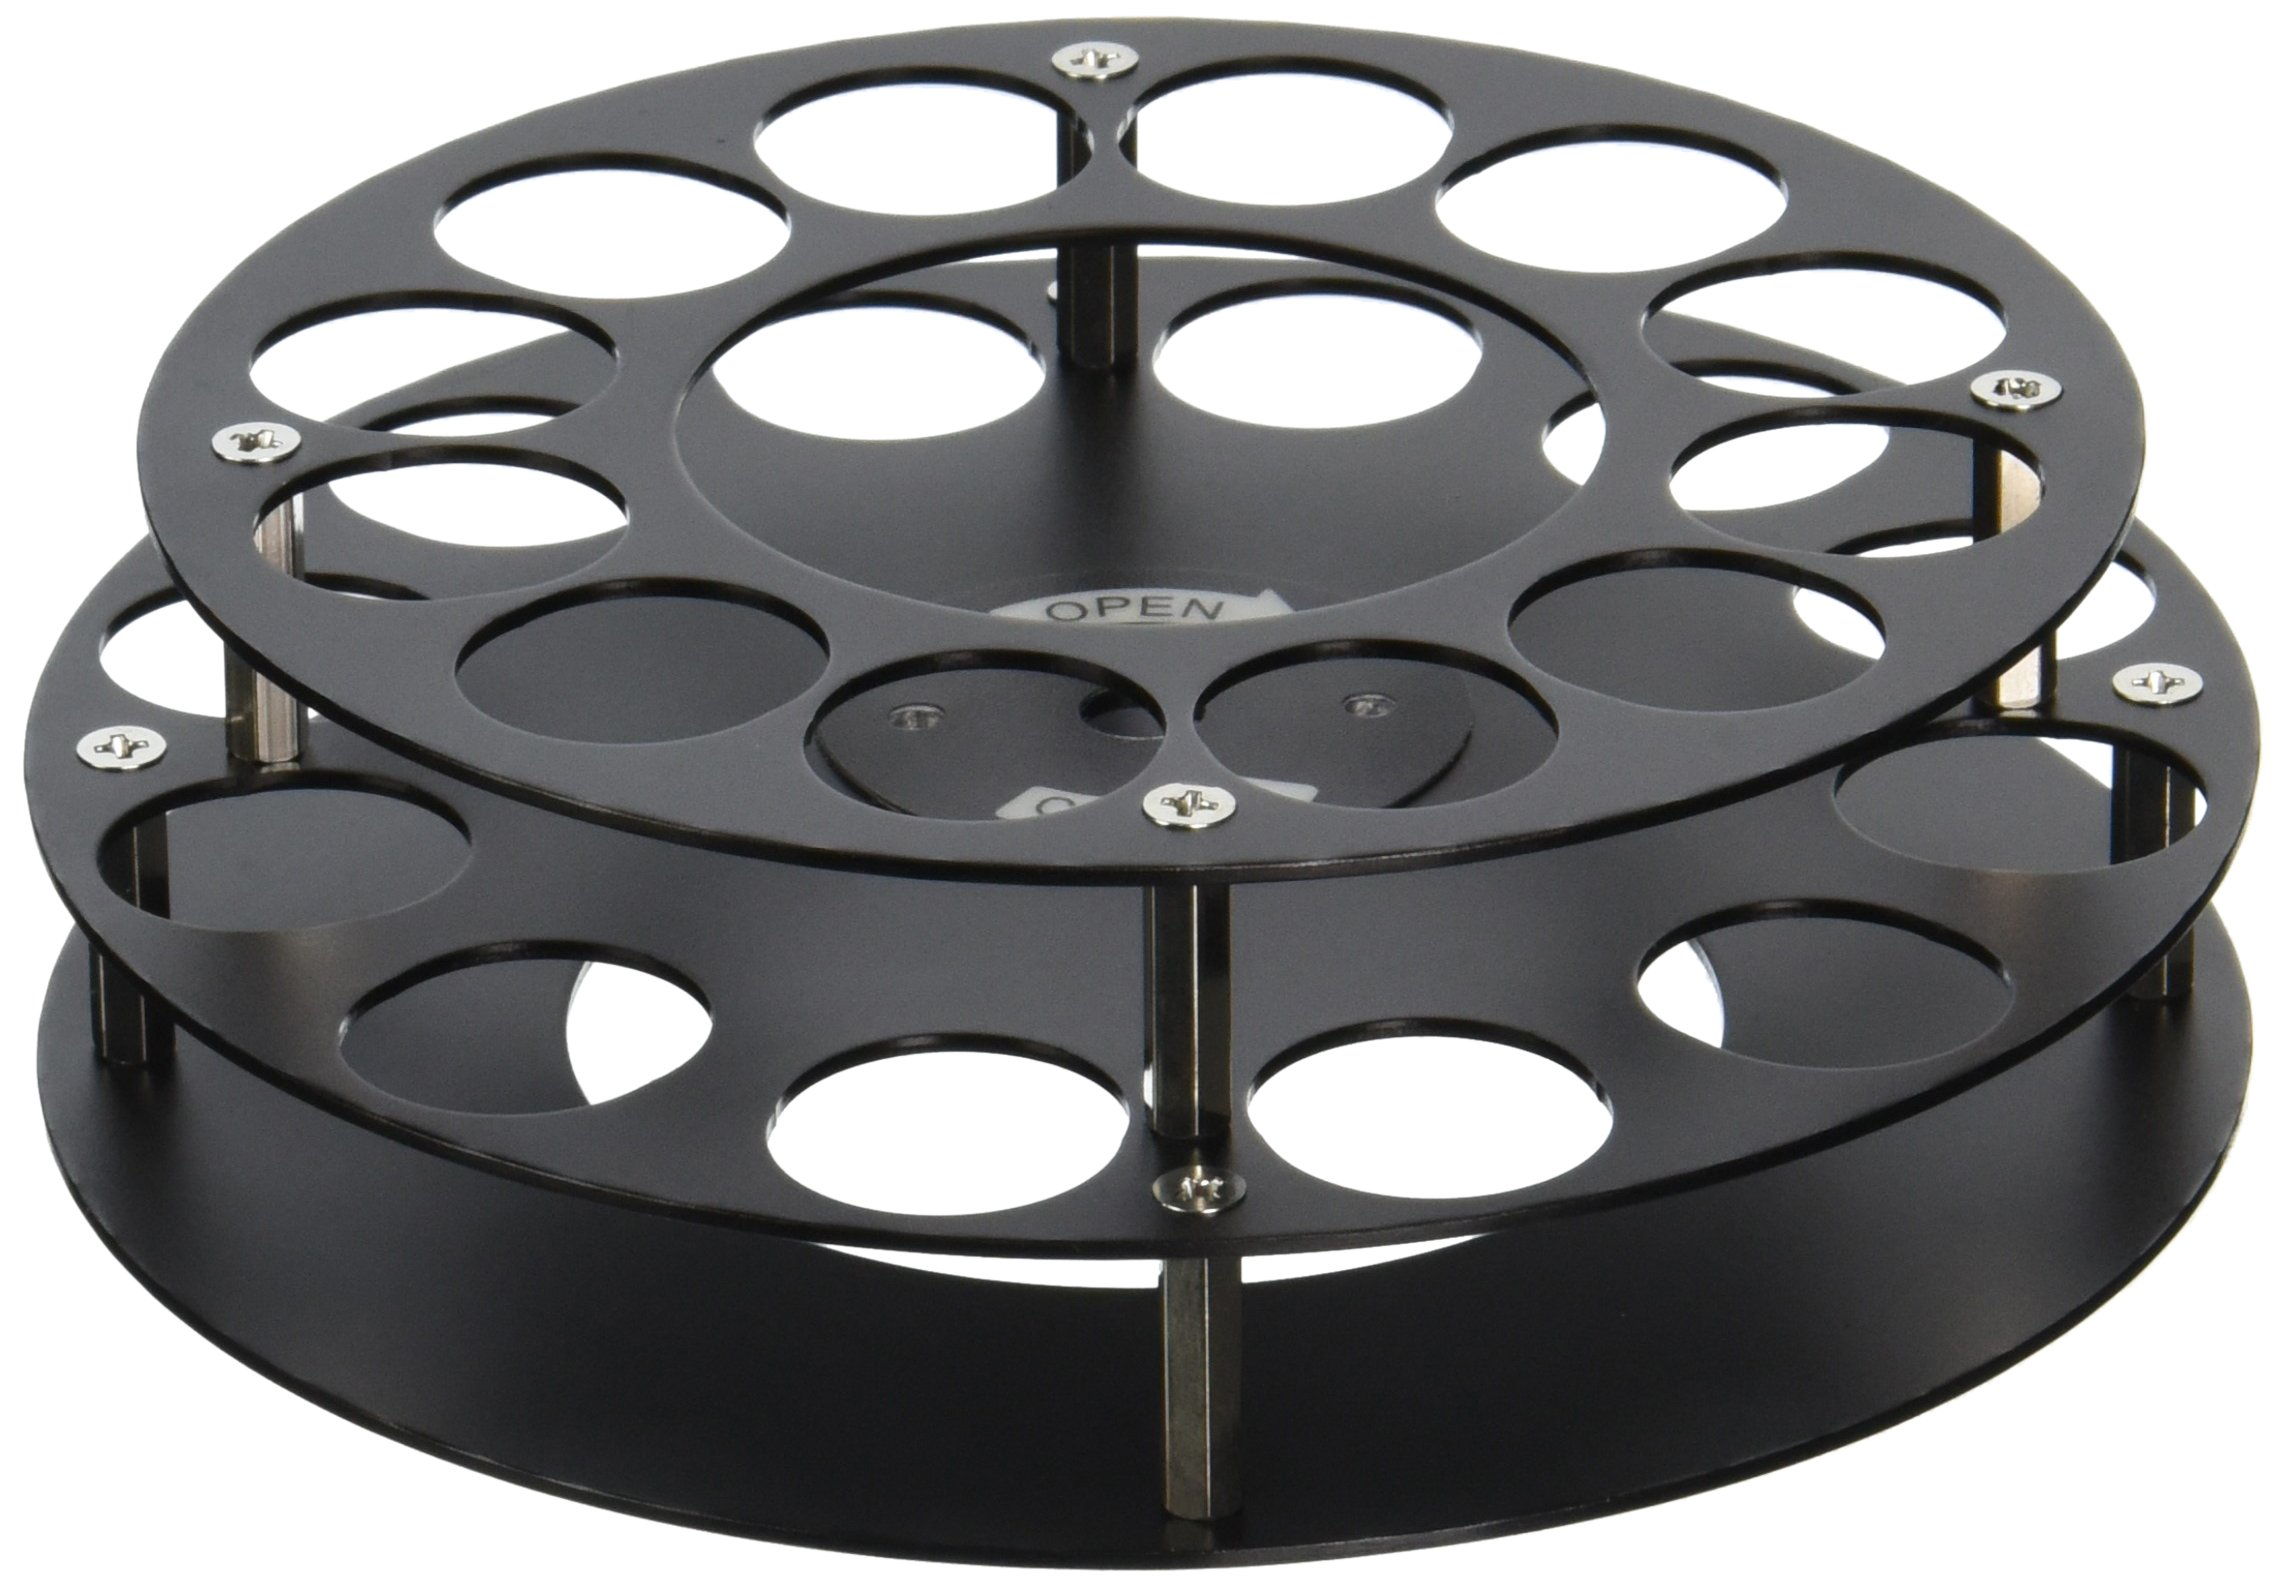 Labconco 7548700 PTFE-Coated Aluminum Vials Fixed-Angle Rotor, Holds 12 x 15ml Vials, 20mm Dia. x 70mm Tall